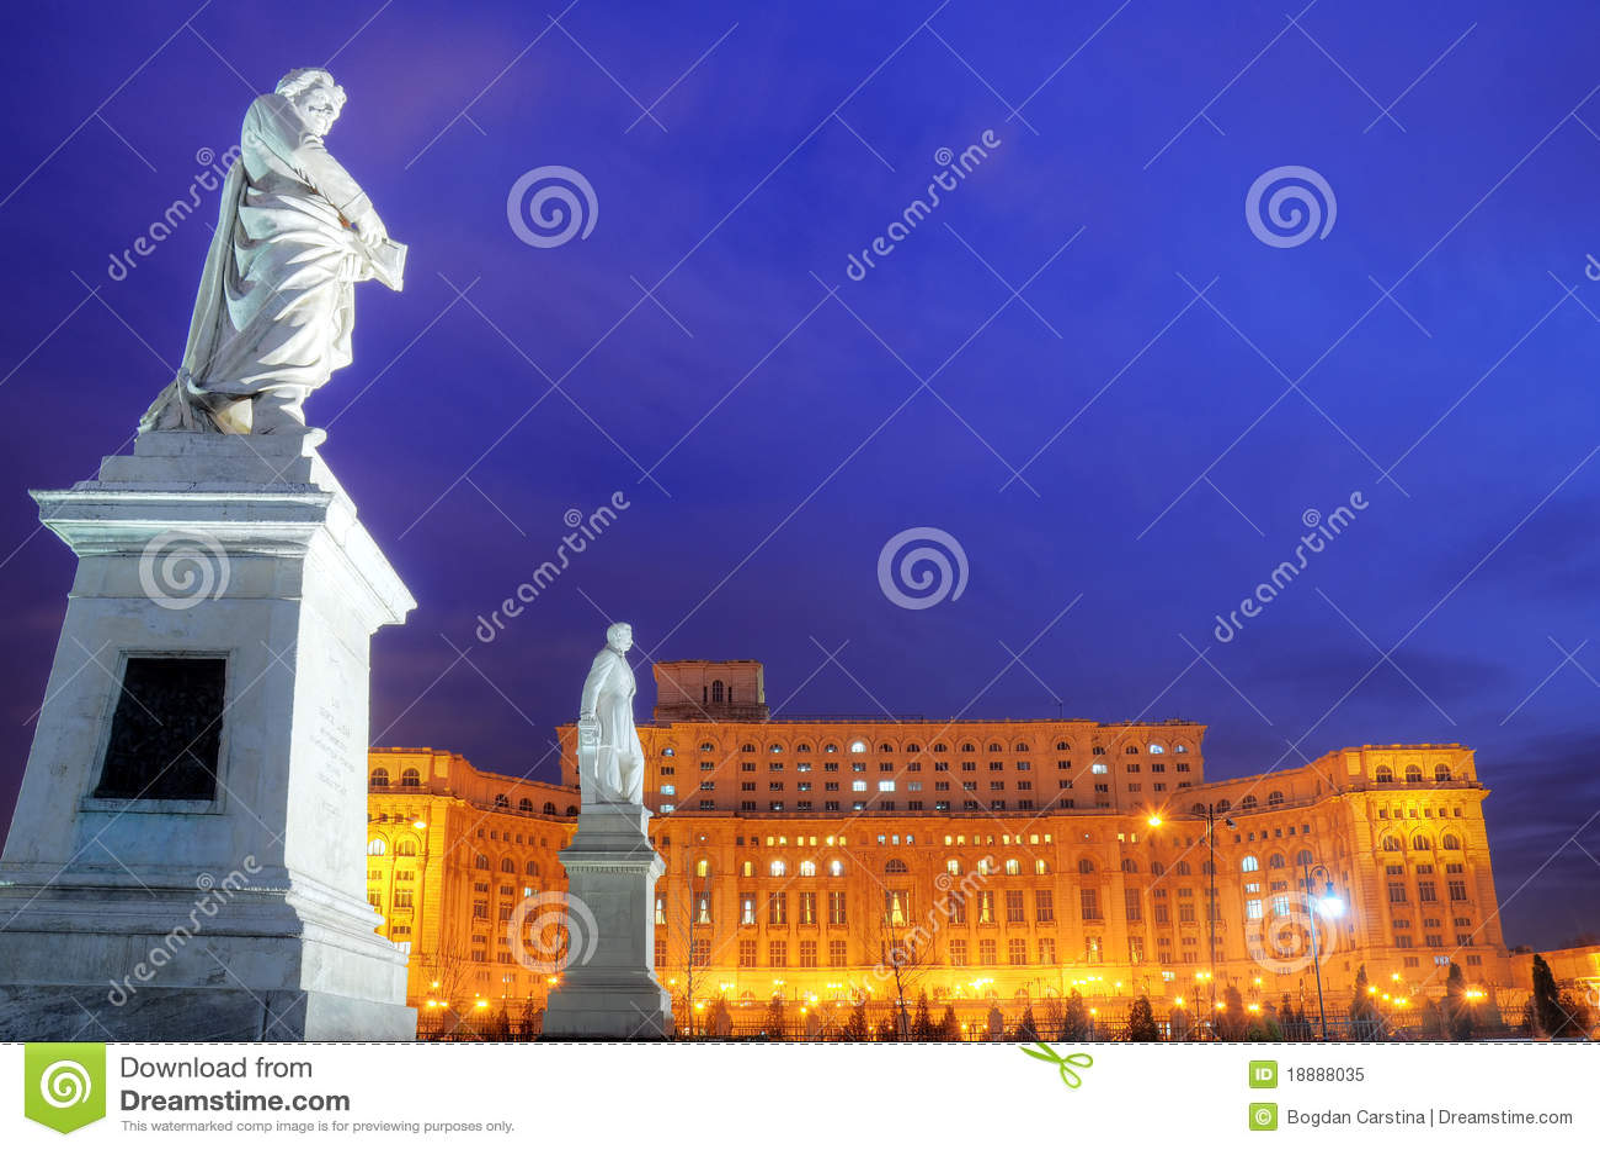 Bucharest palace parliament